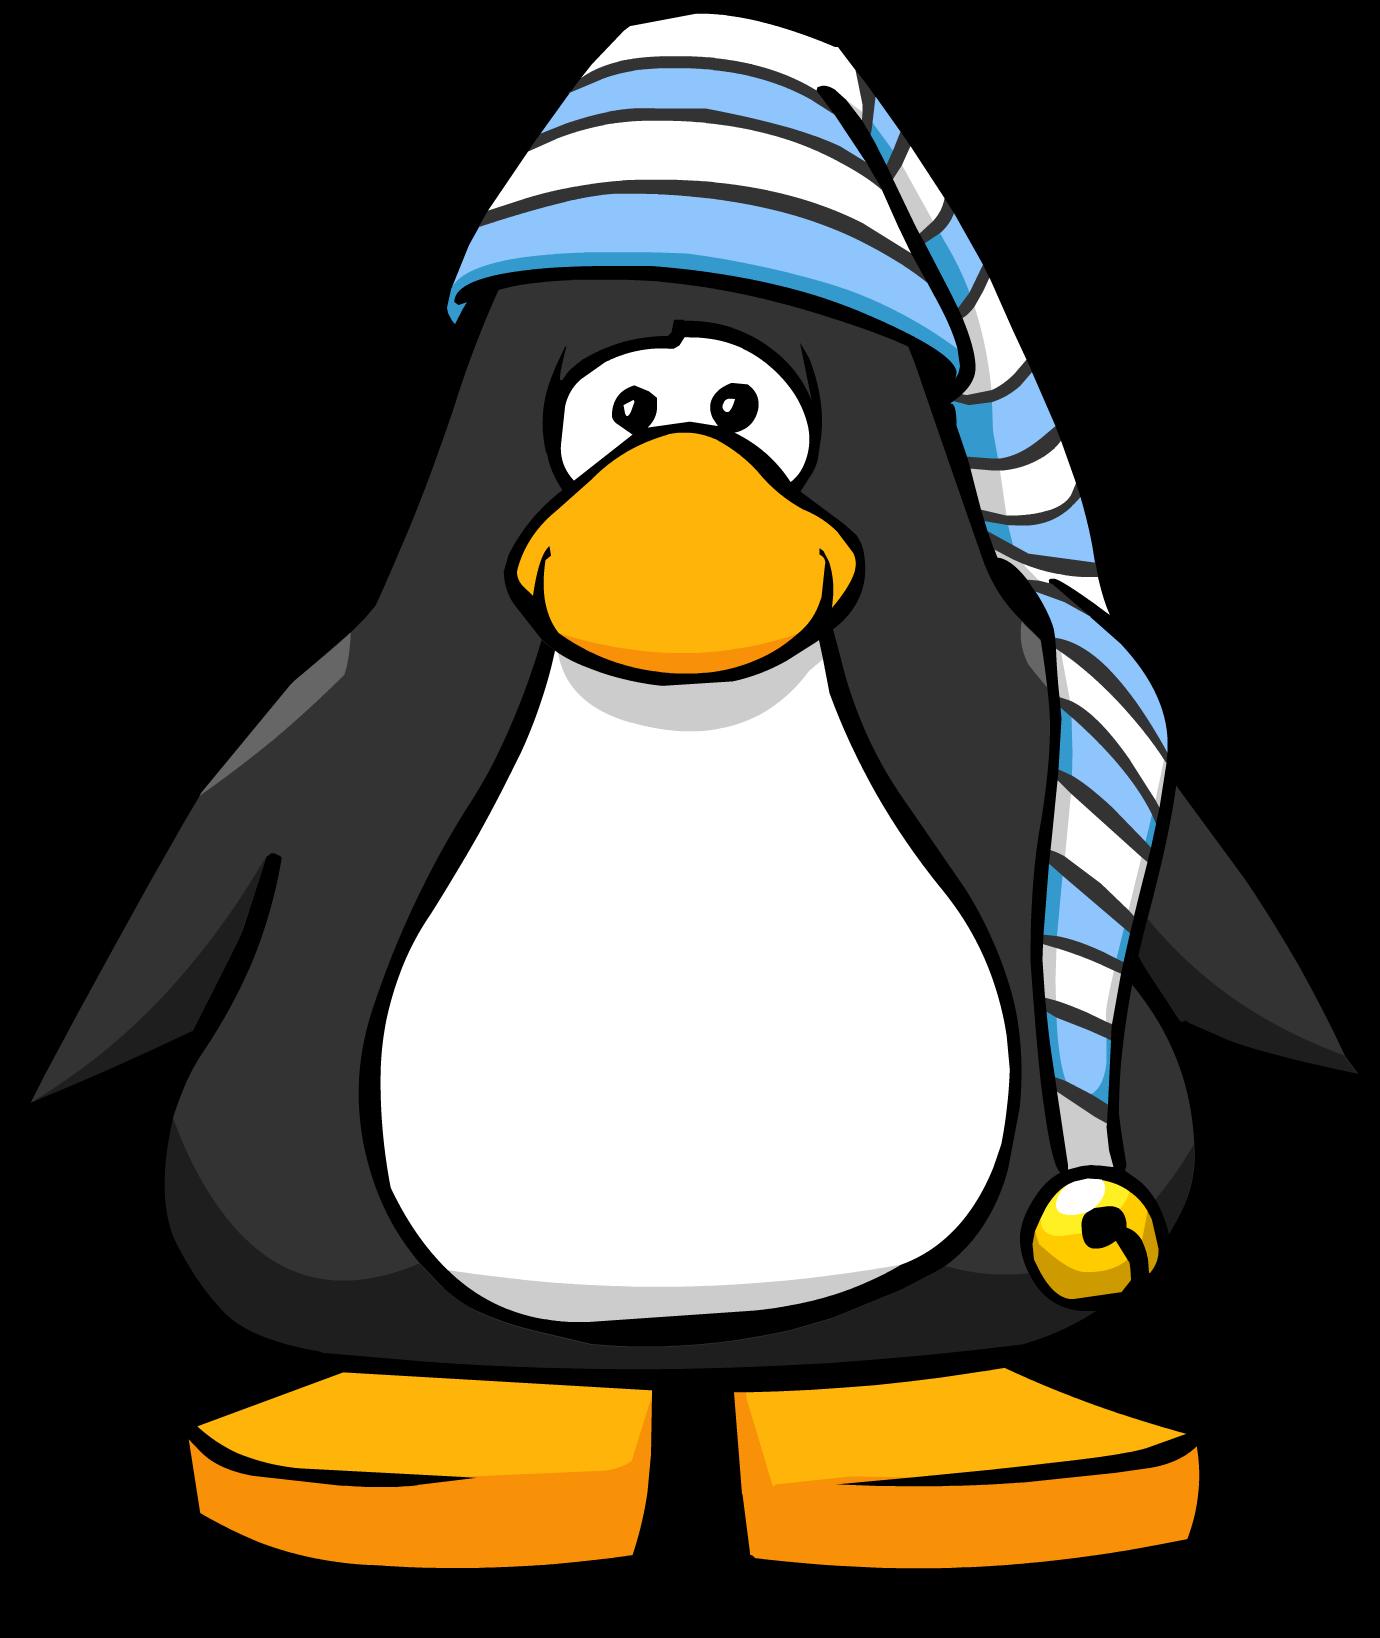 Clipart penguin graduation. Image stocking cap playercard